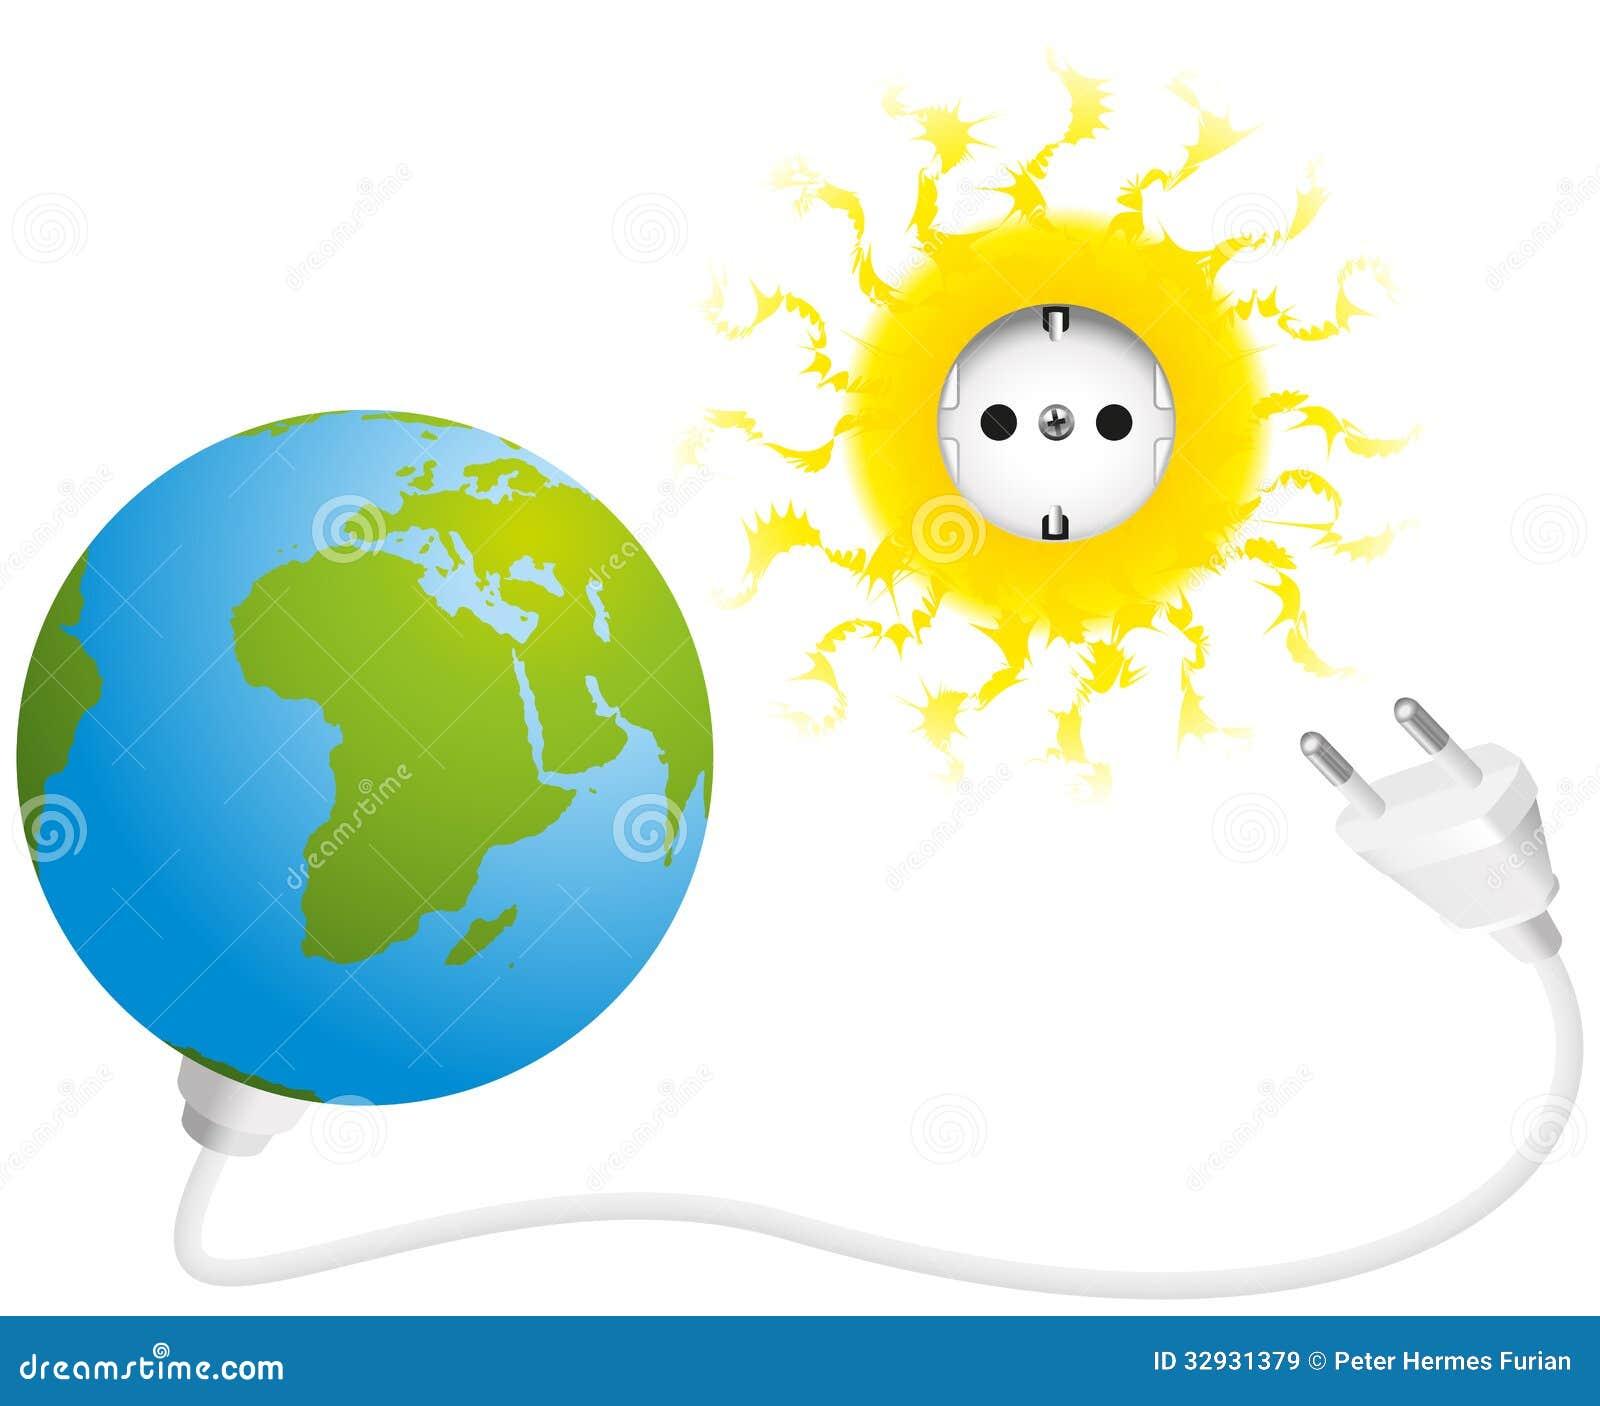 Illustration of sun, earth, socket and plug, a symbol for solar energy ...